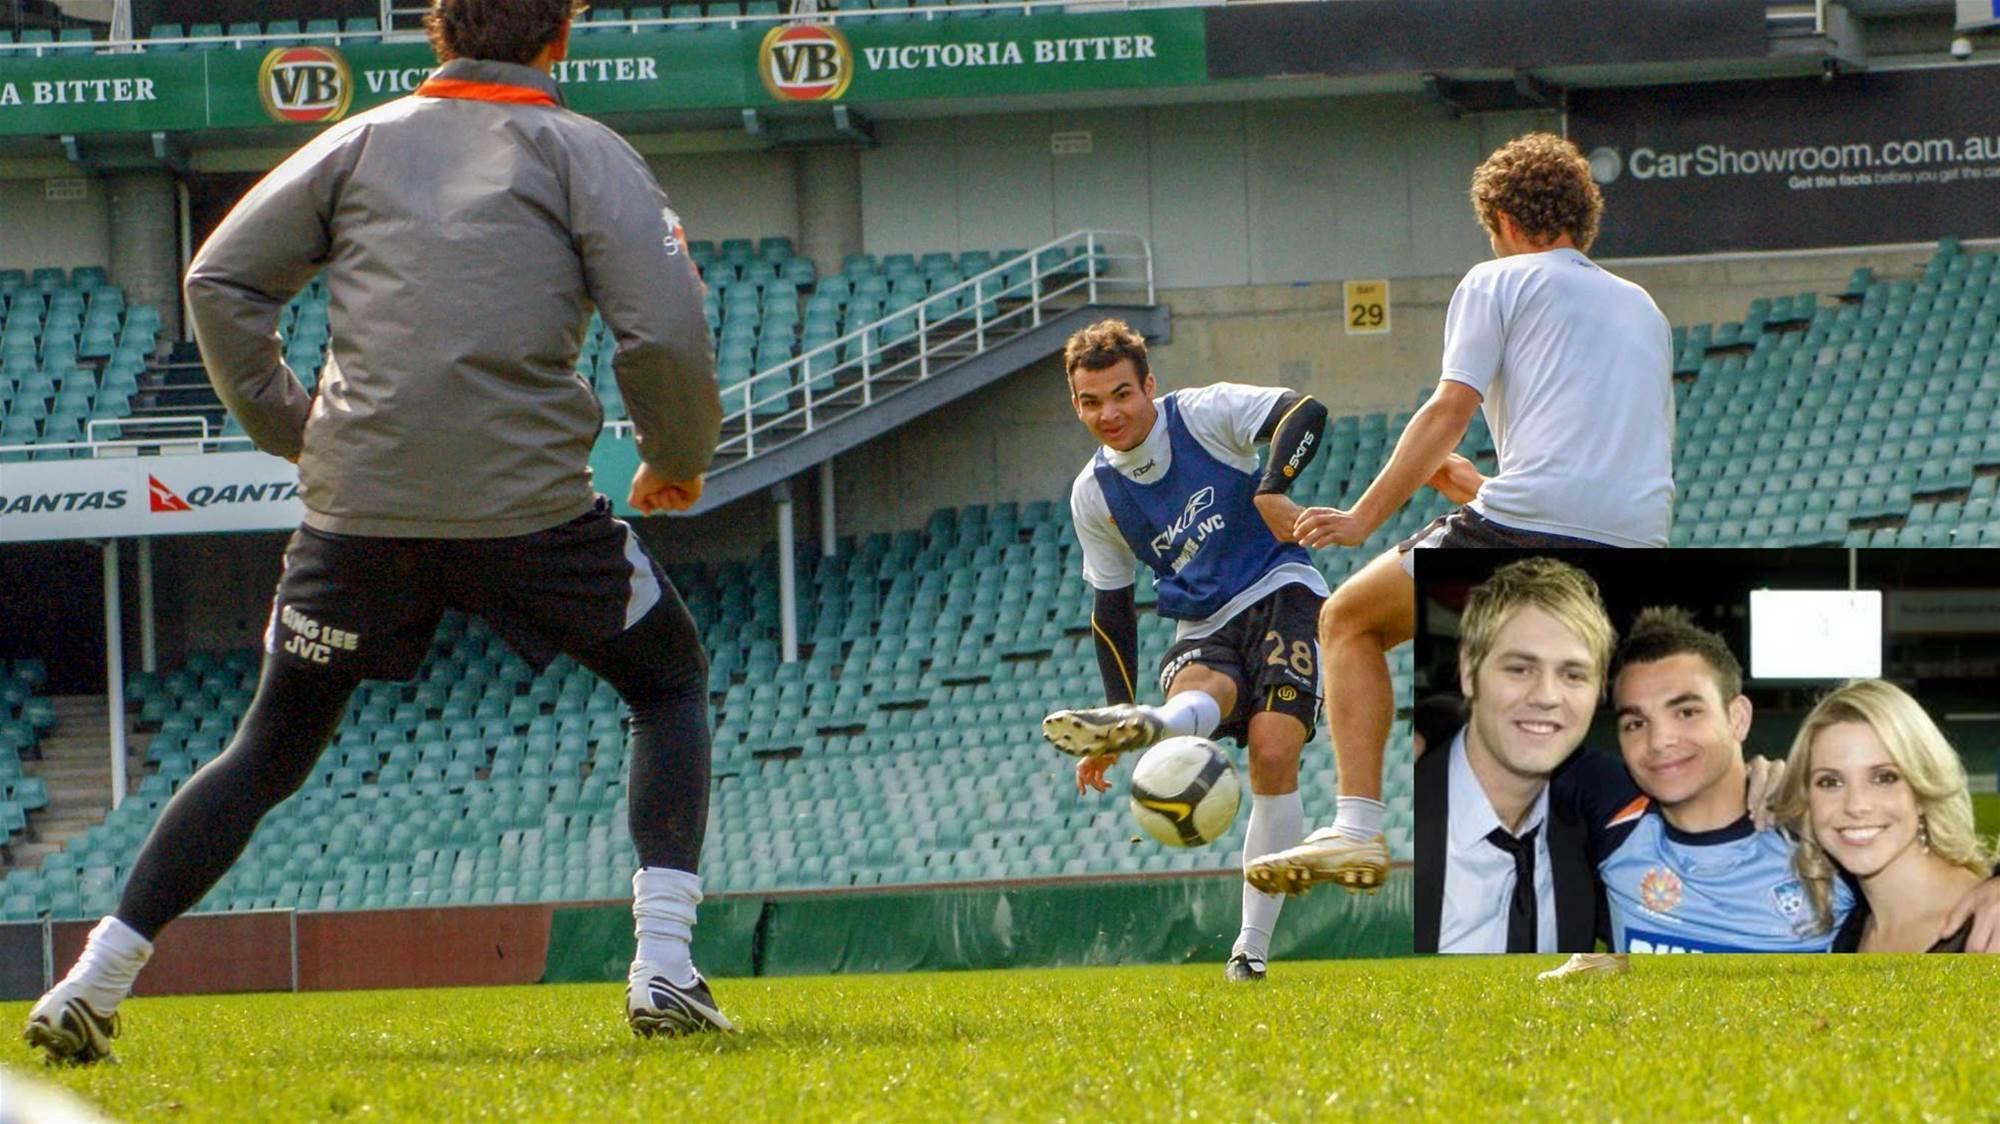 What happened to Football Superstar TV show winner?